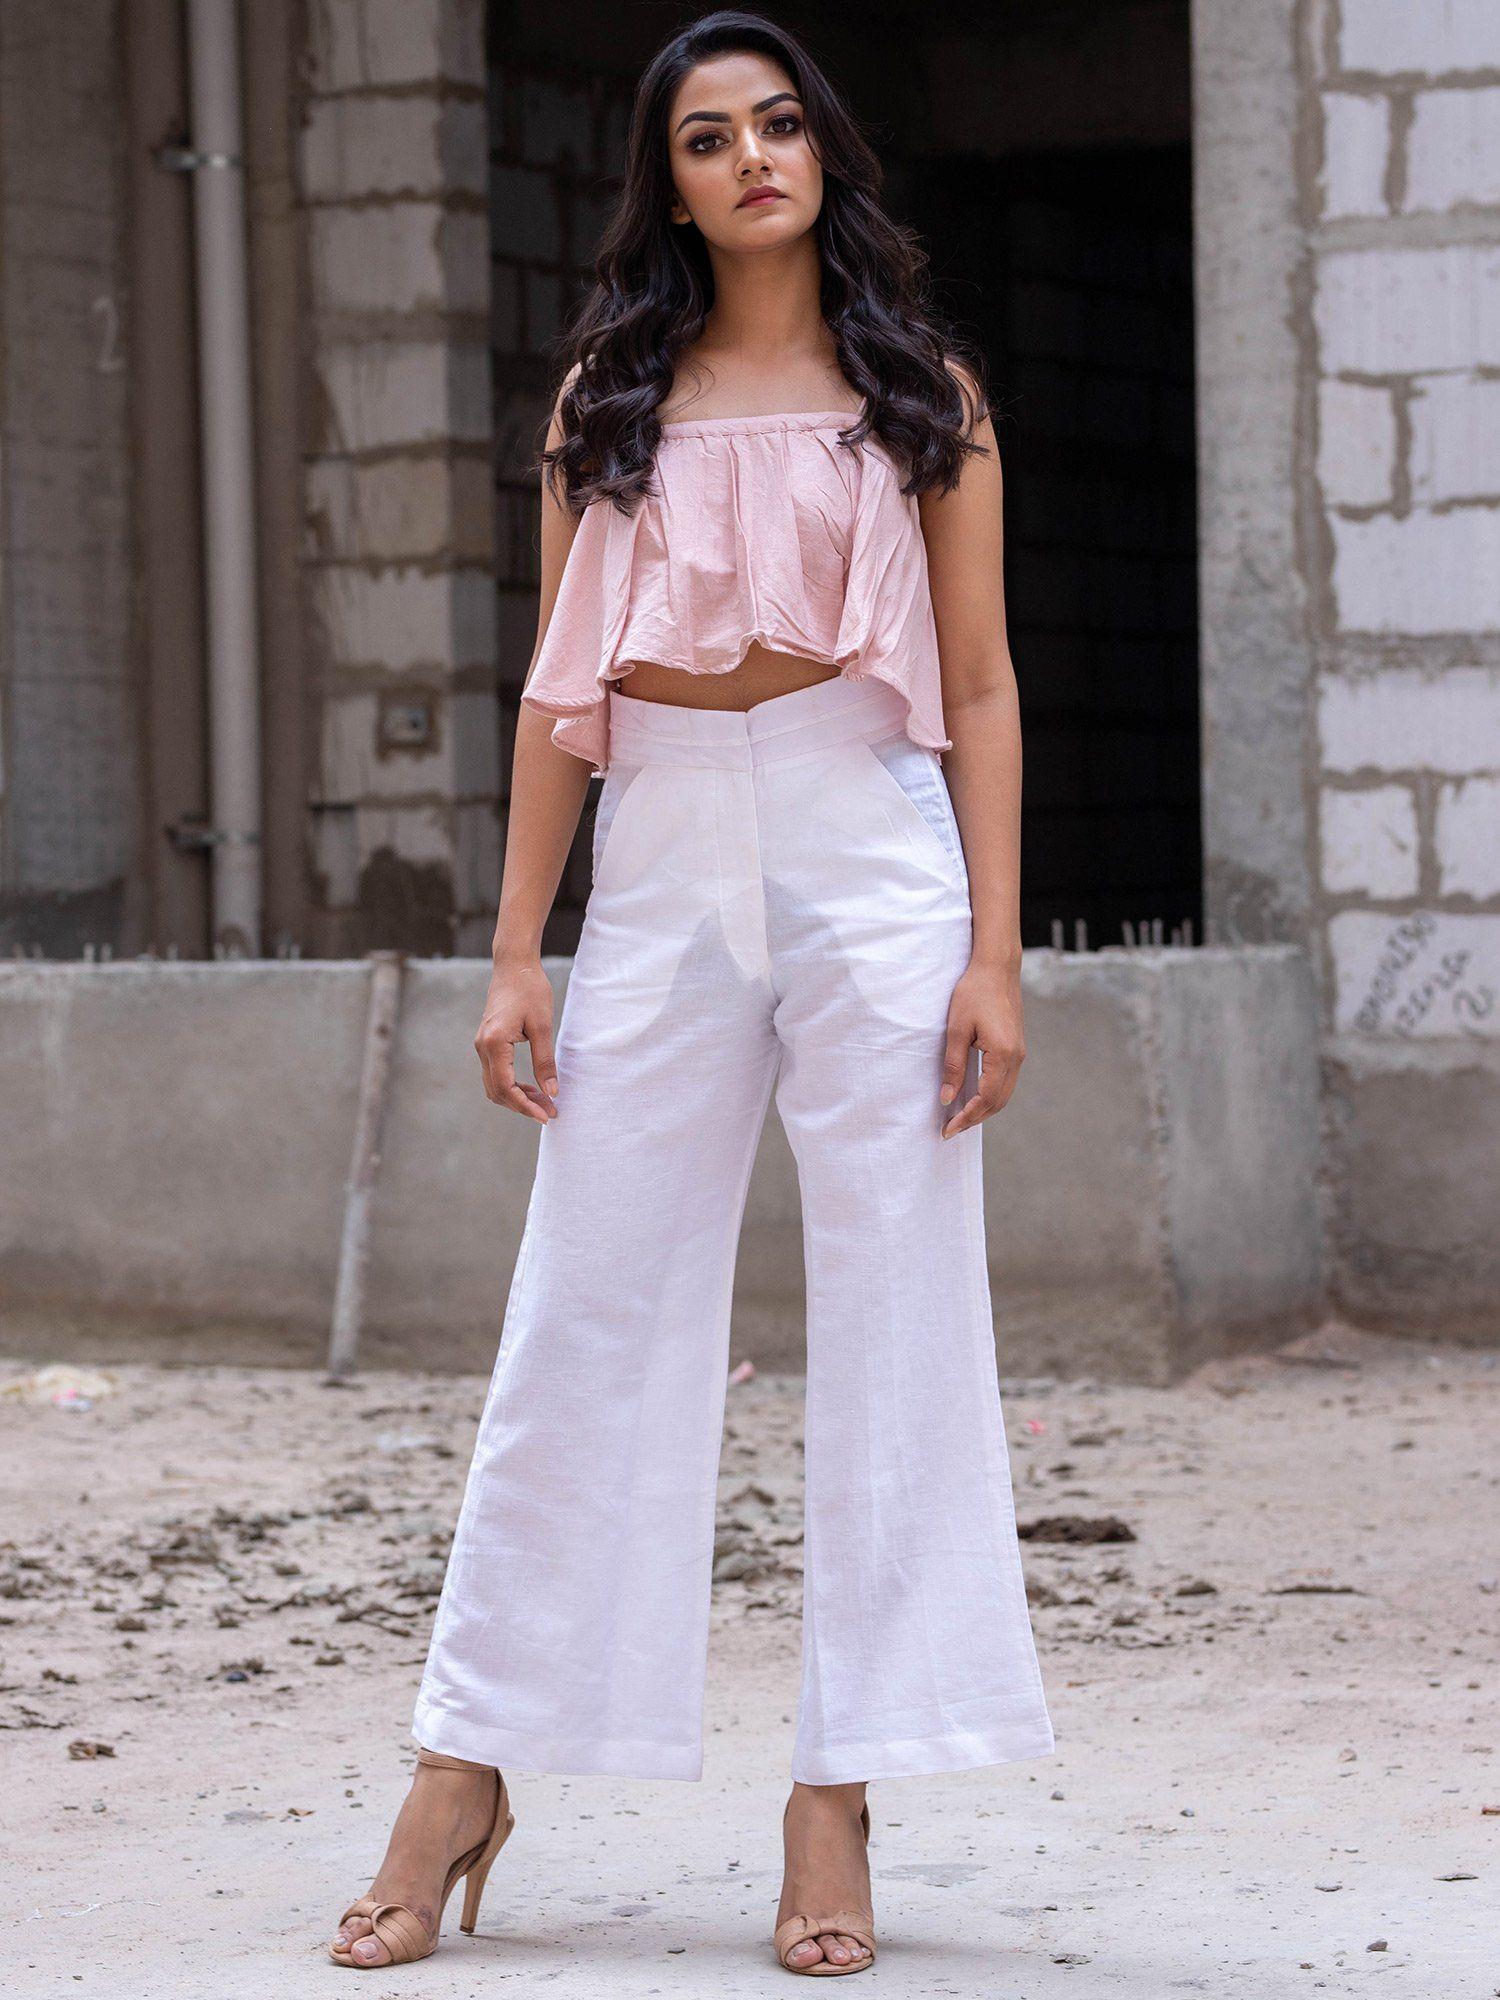 Fancy Pastels Shirts Tops and Crop Tops : Buy Fancy Pastels Parsa ...